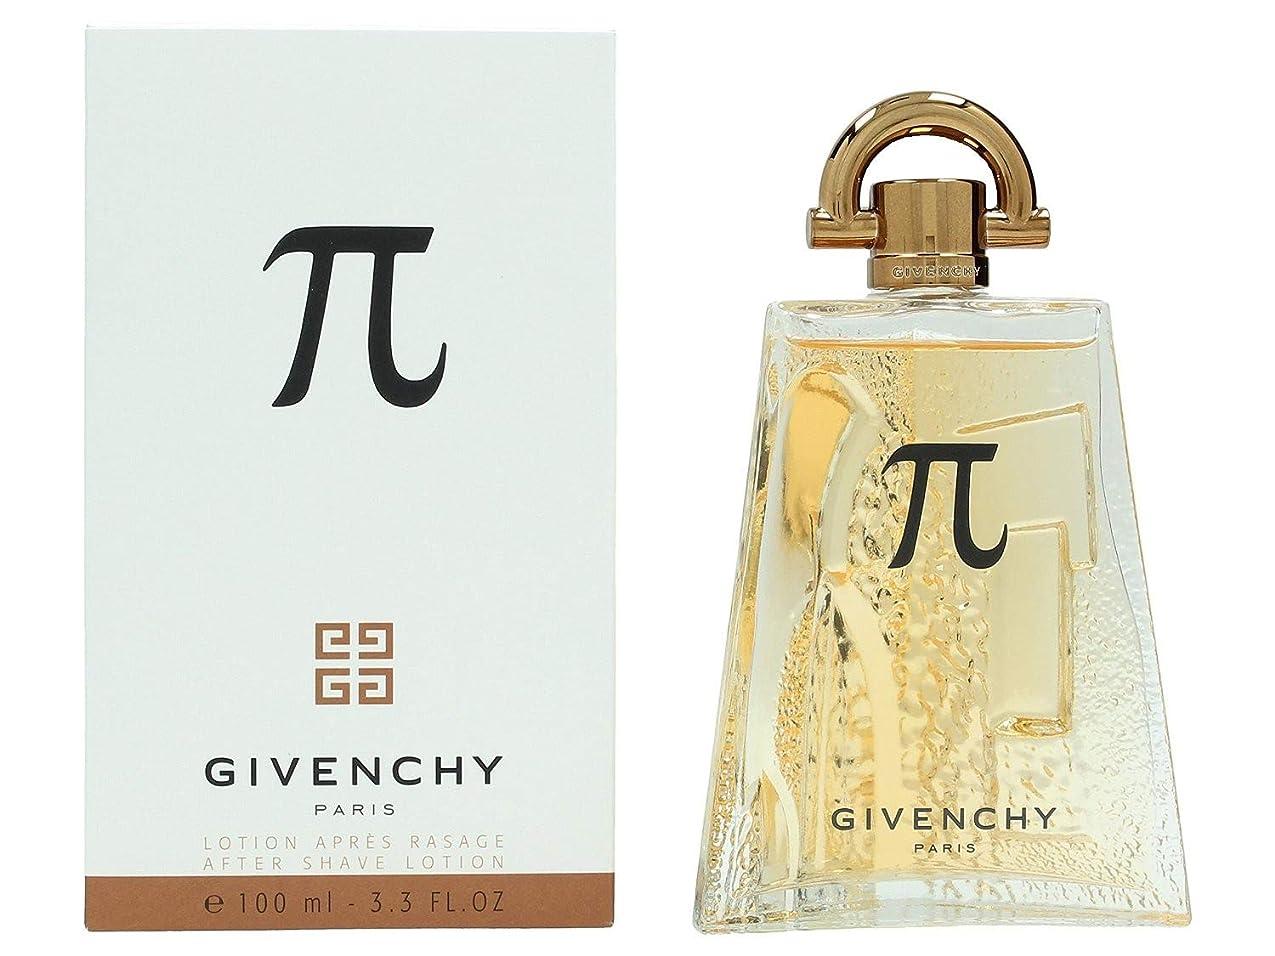 Givenchy P?? 100ml